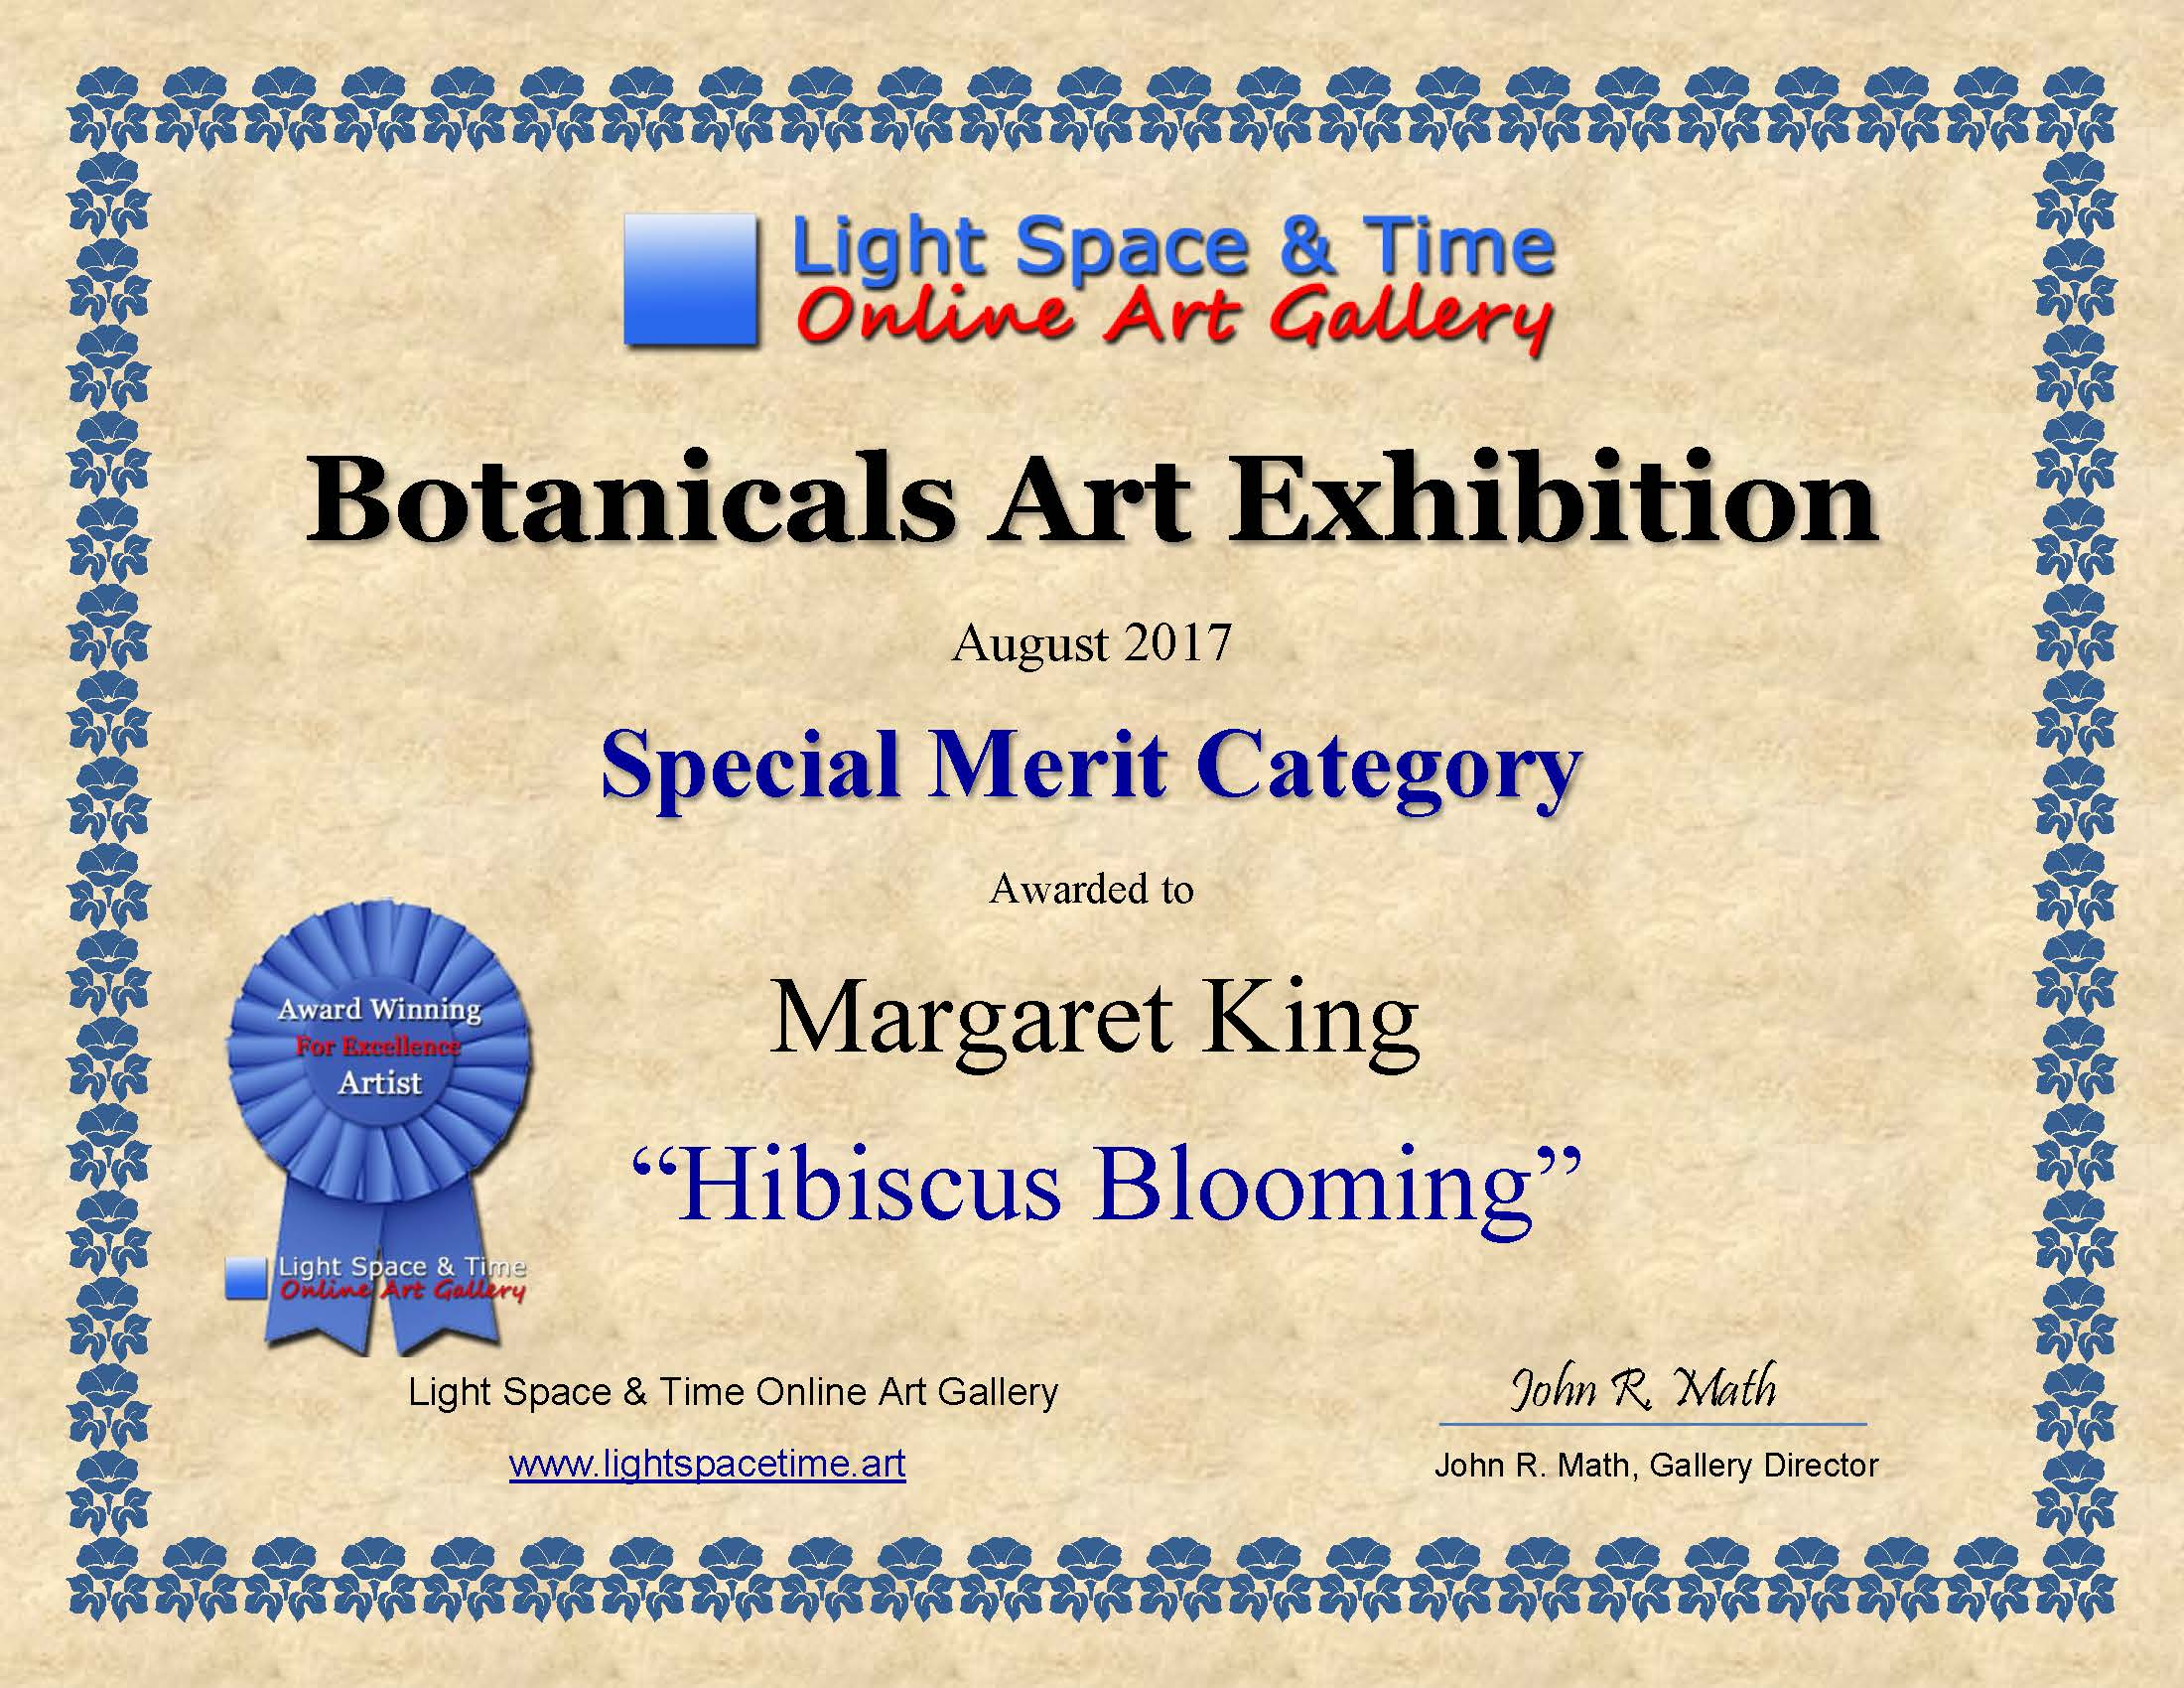 SM - Margaret King - BOTANICALS  ART EXHIBITION AWARD CERTIFICATE.jpg